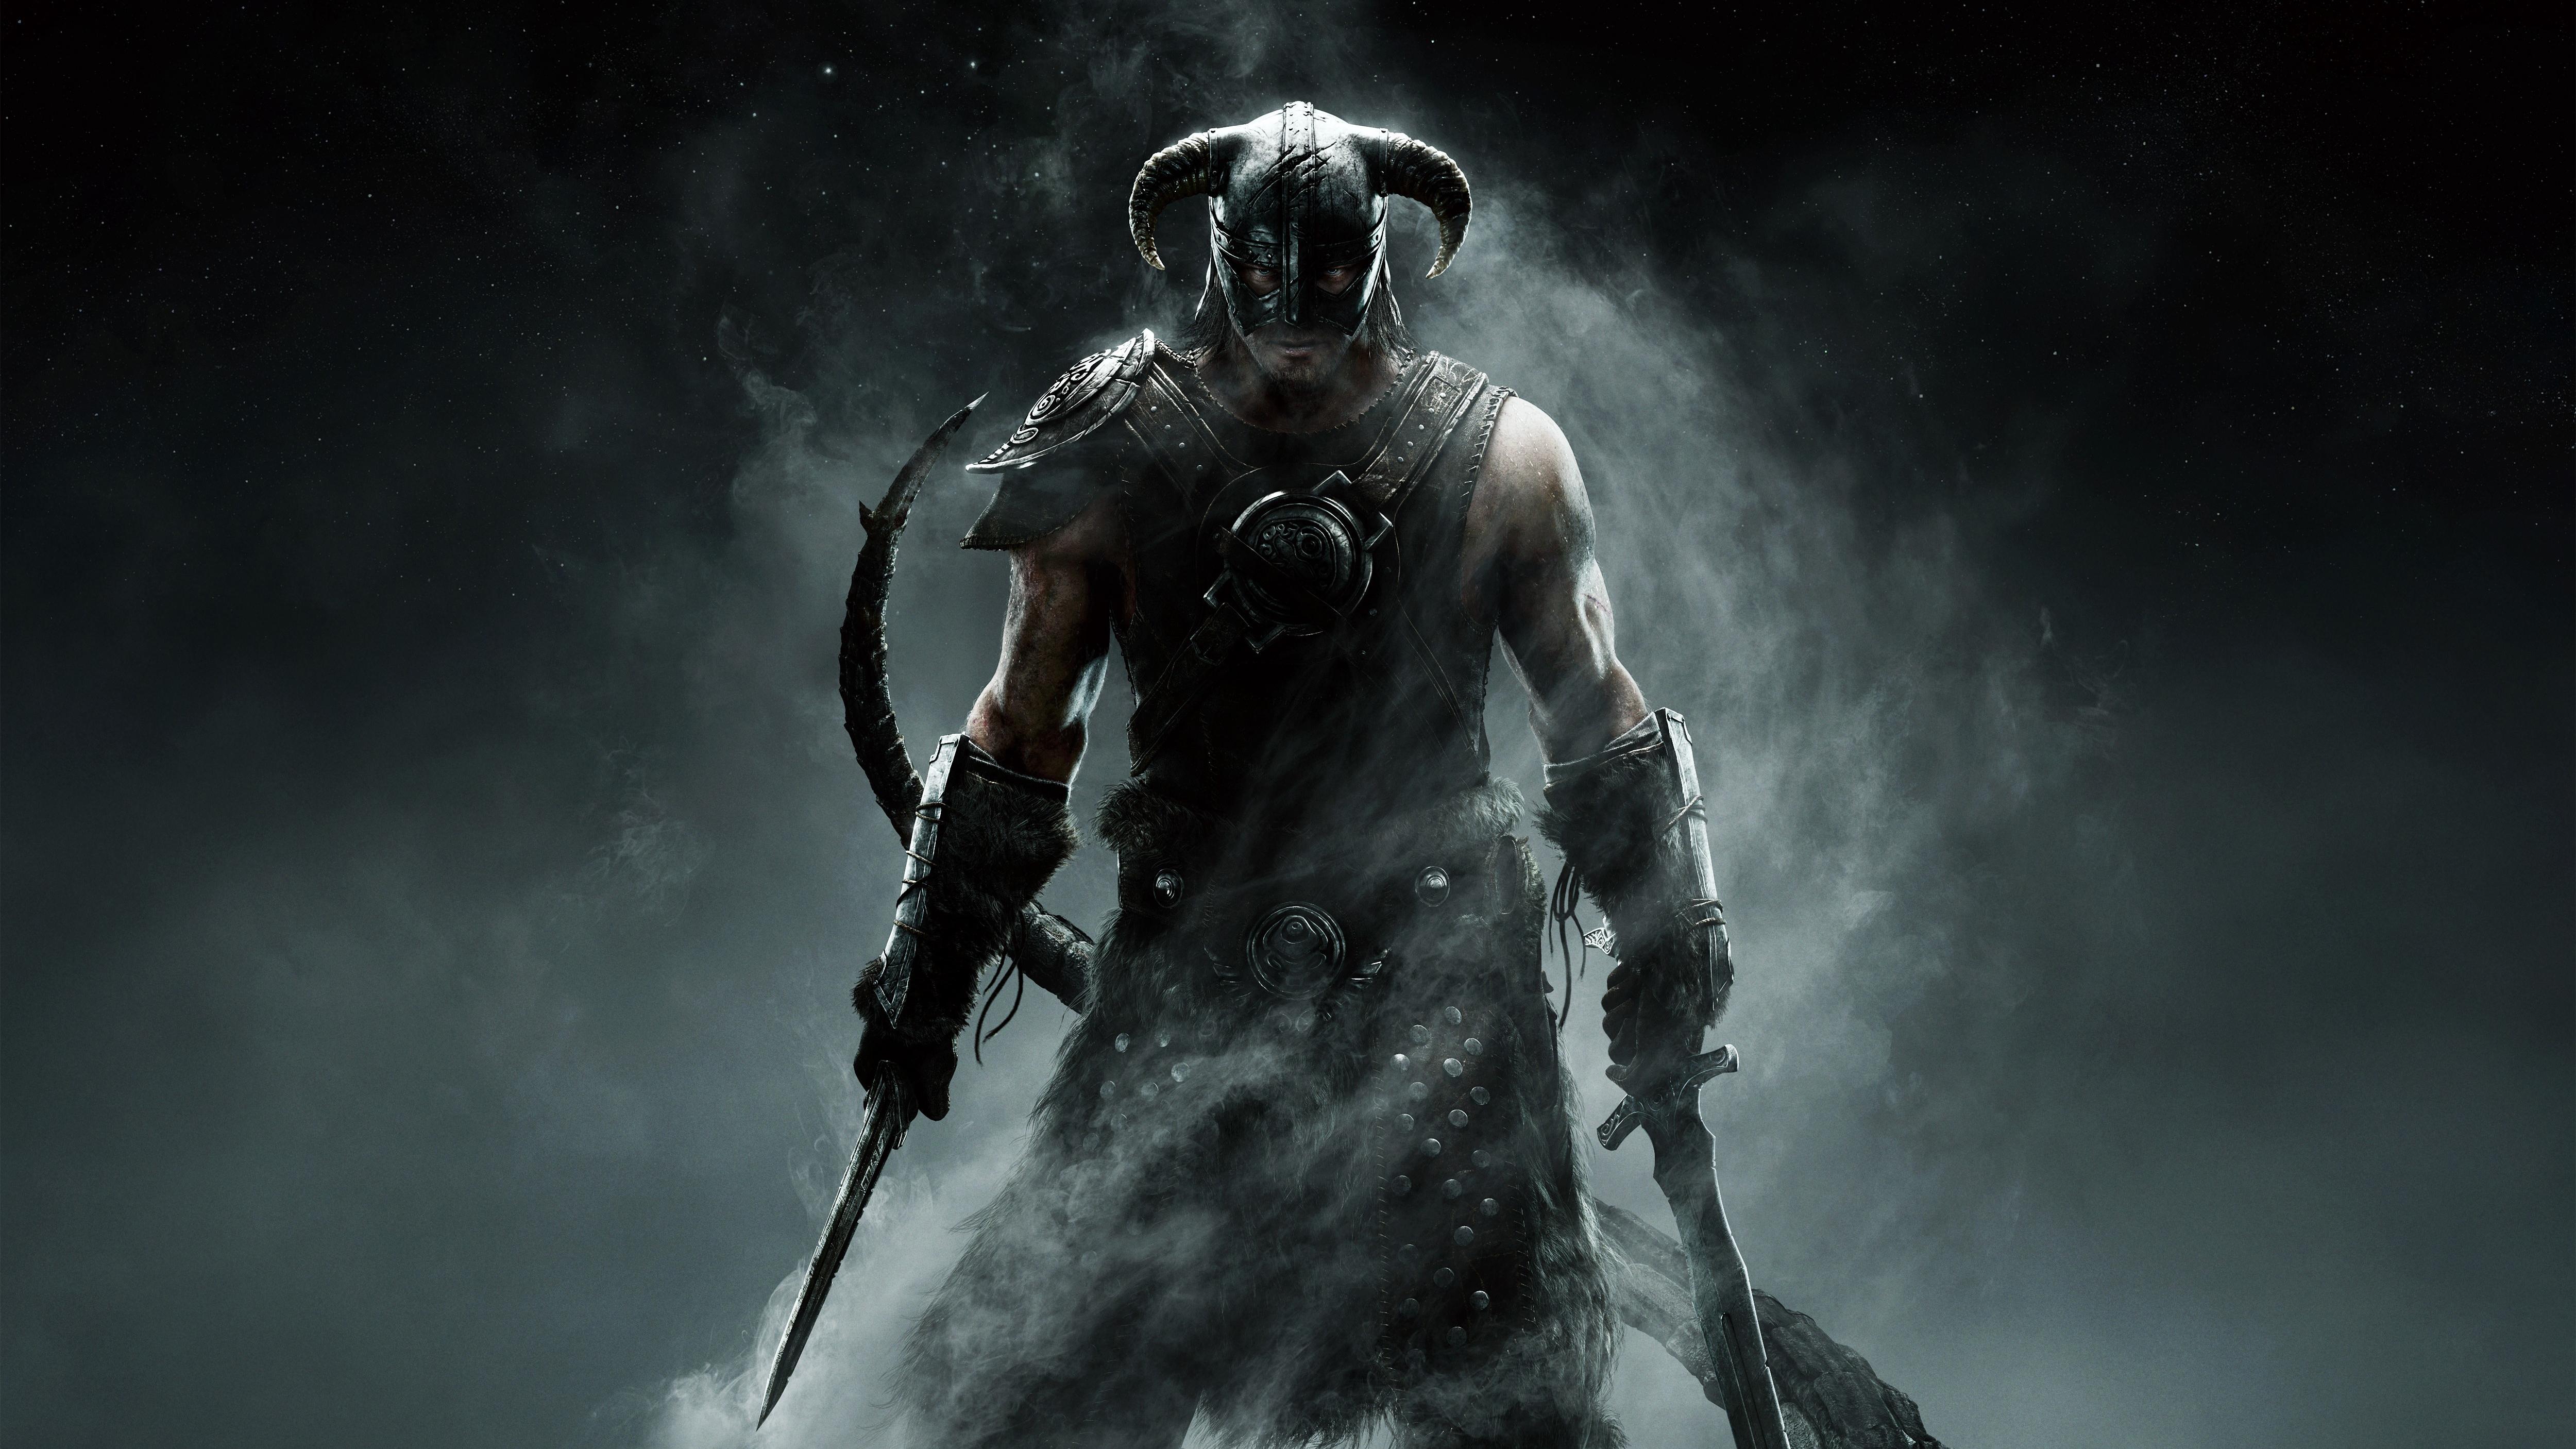 The Elder Scrolls V Skyrim 5k Hd Games 4k Wallpapers